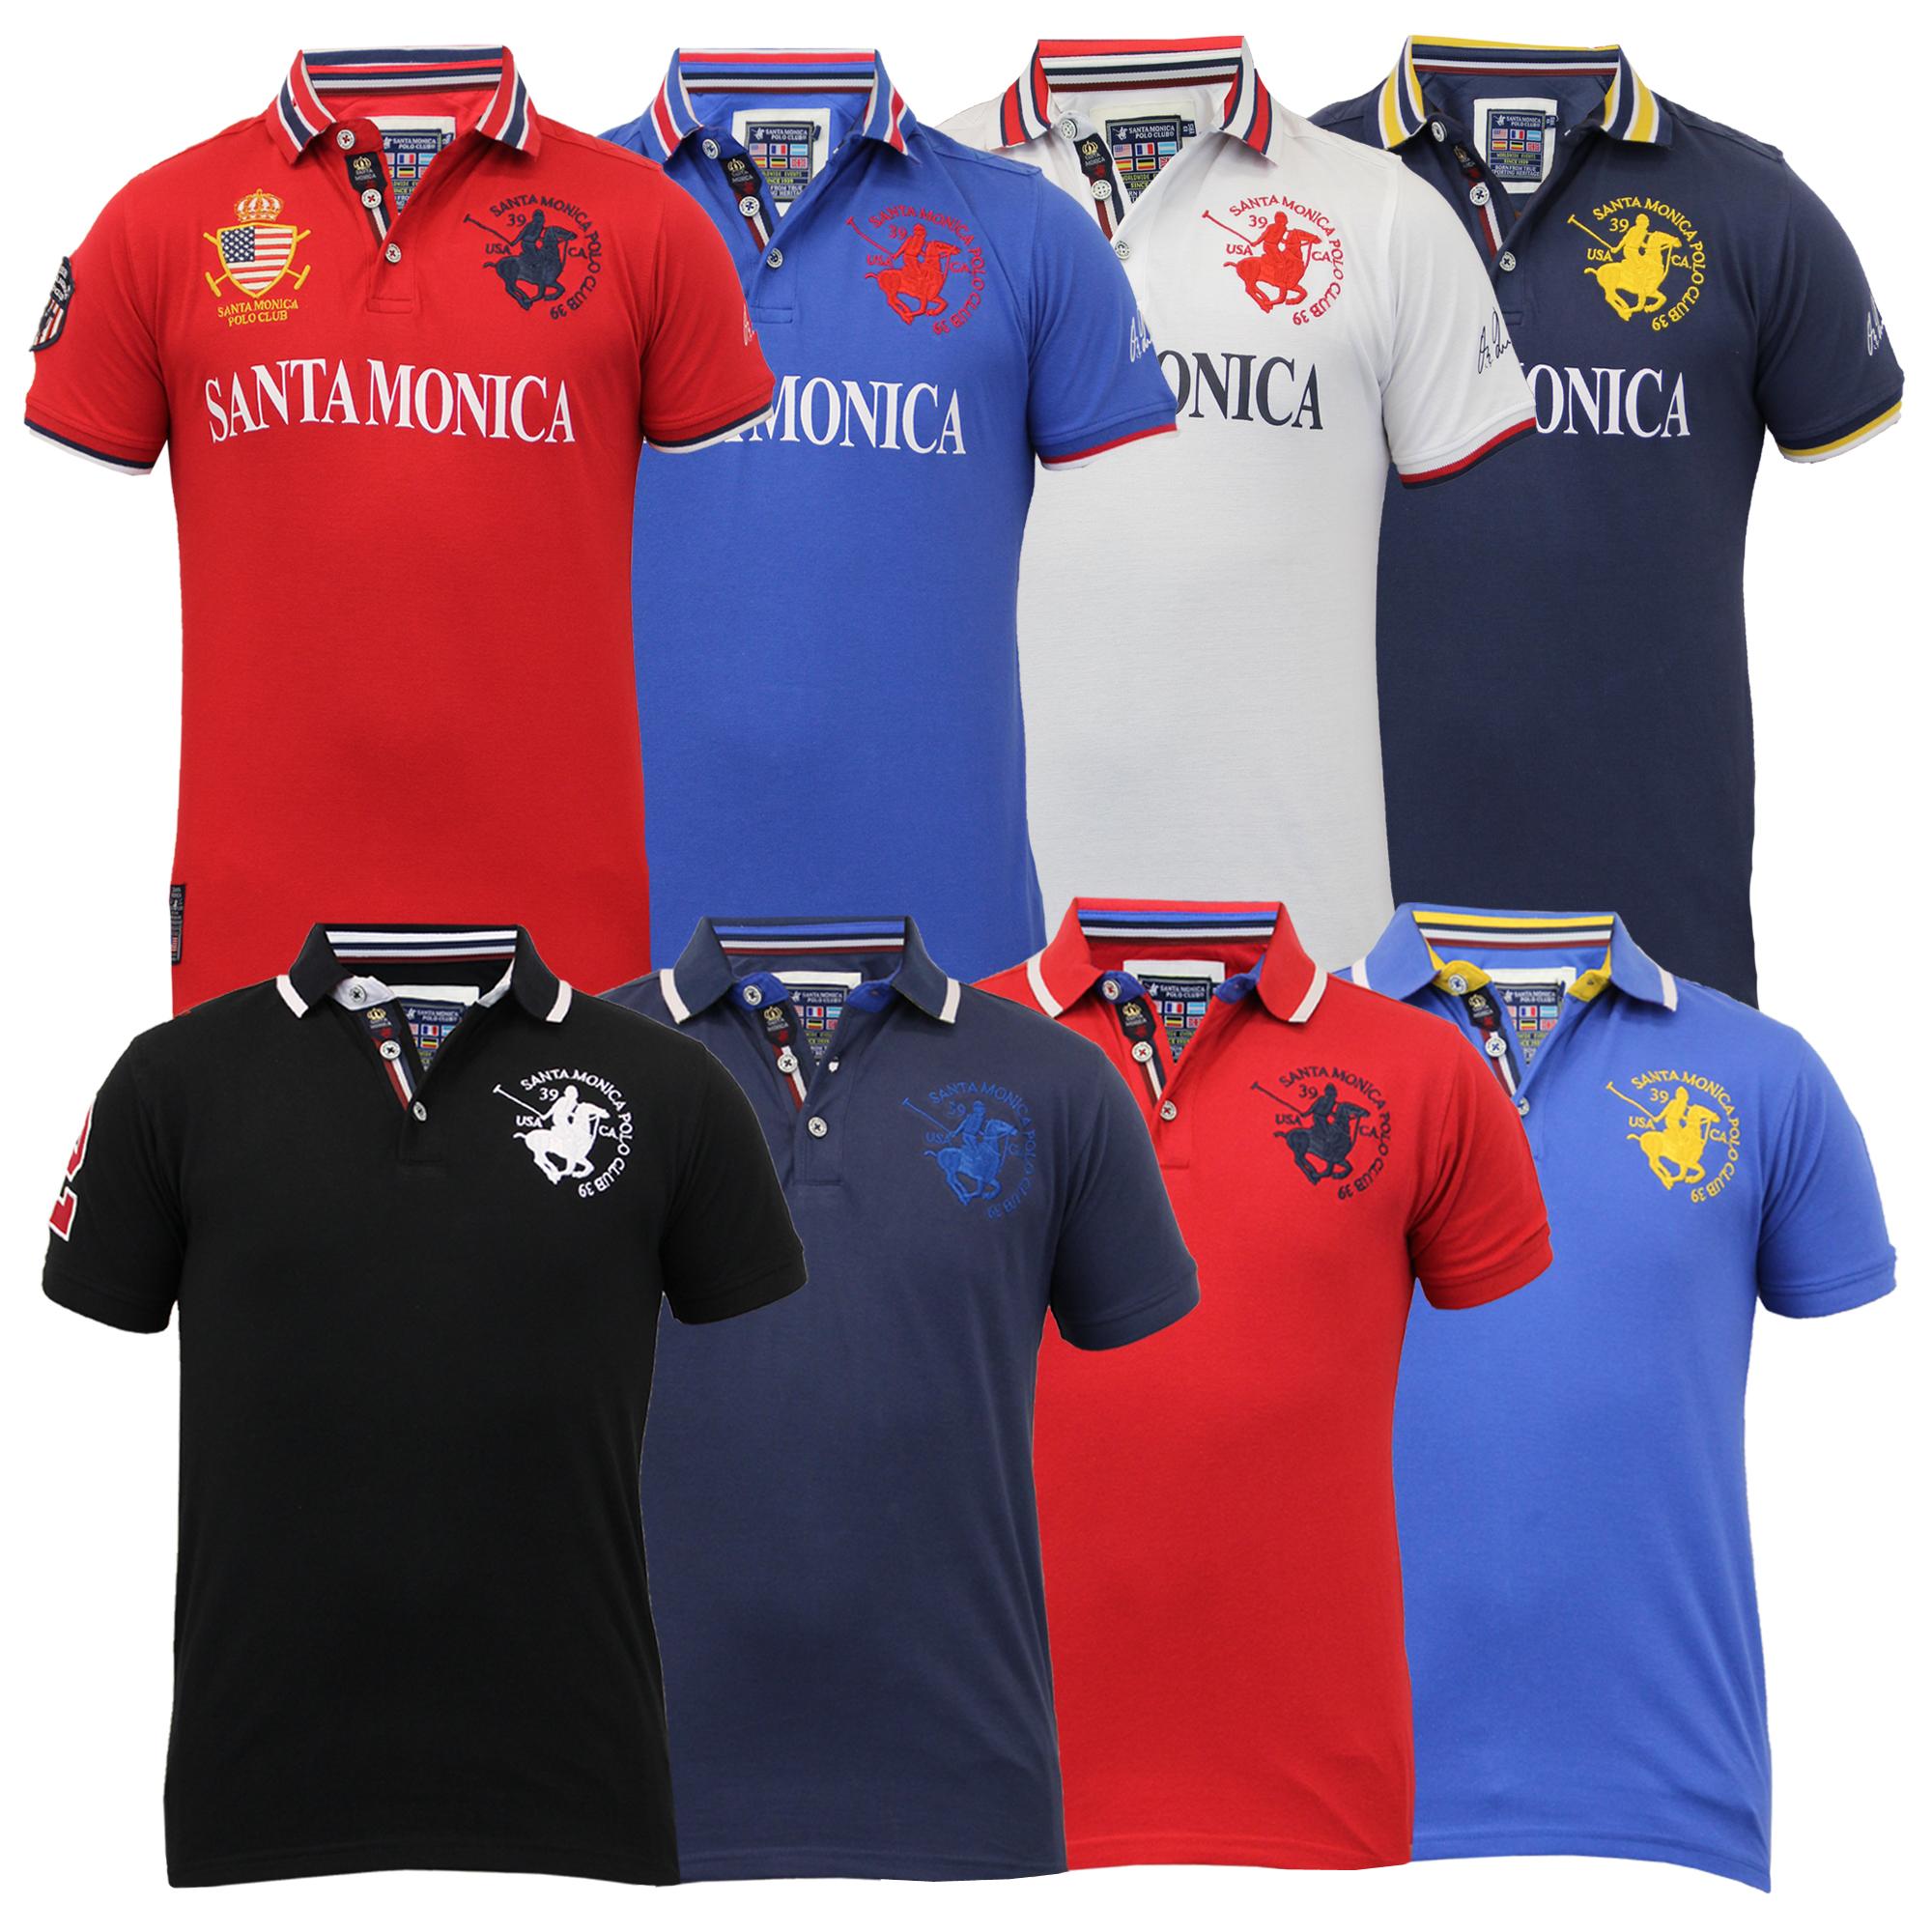 2371196334 Details about Boys Polo T Shirt Santa Monica Kids Pique Top American USA  Short Sleeved Summer